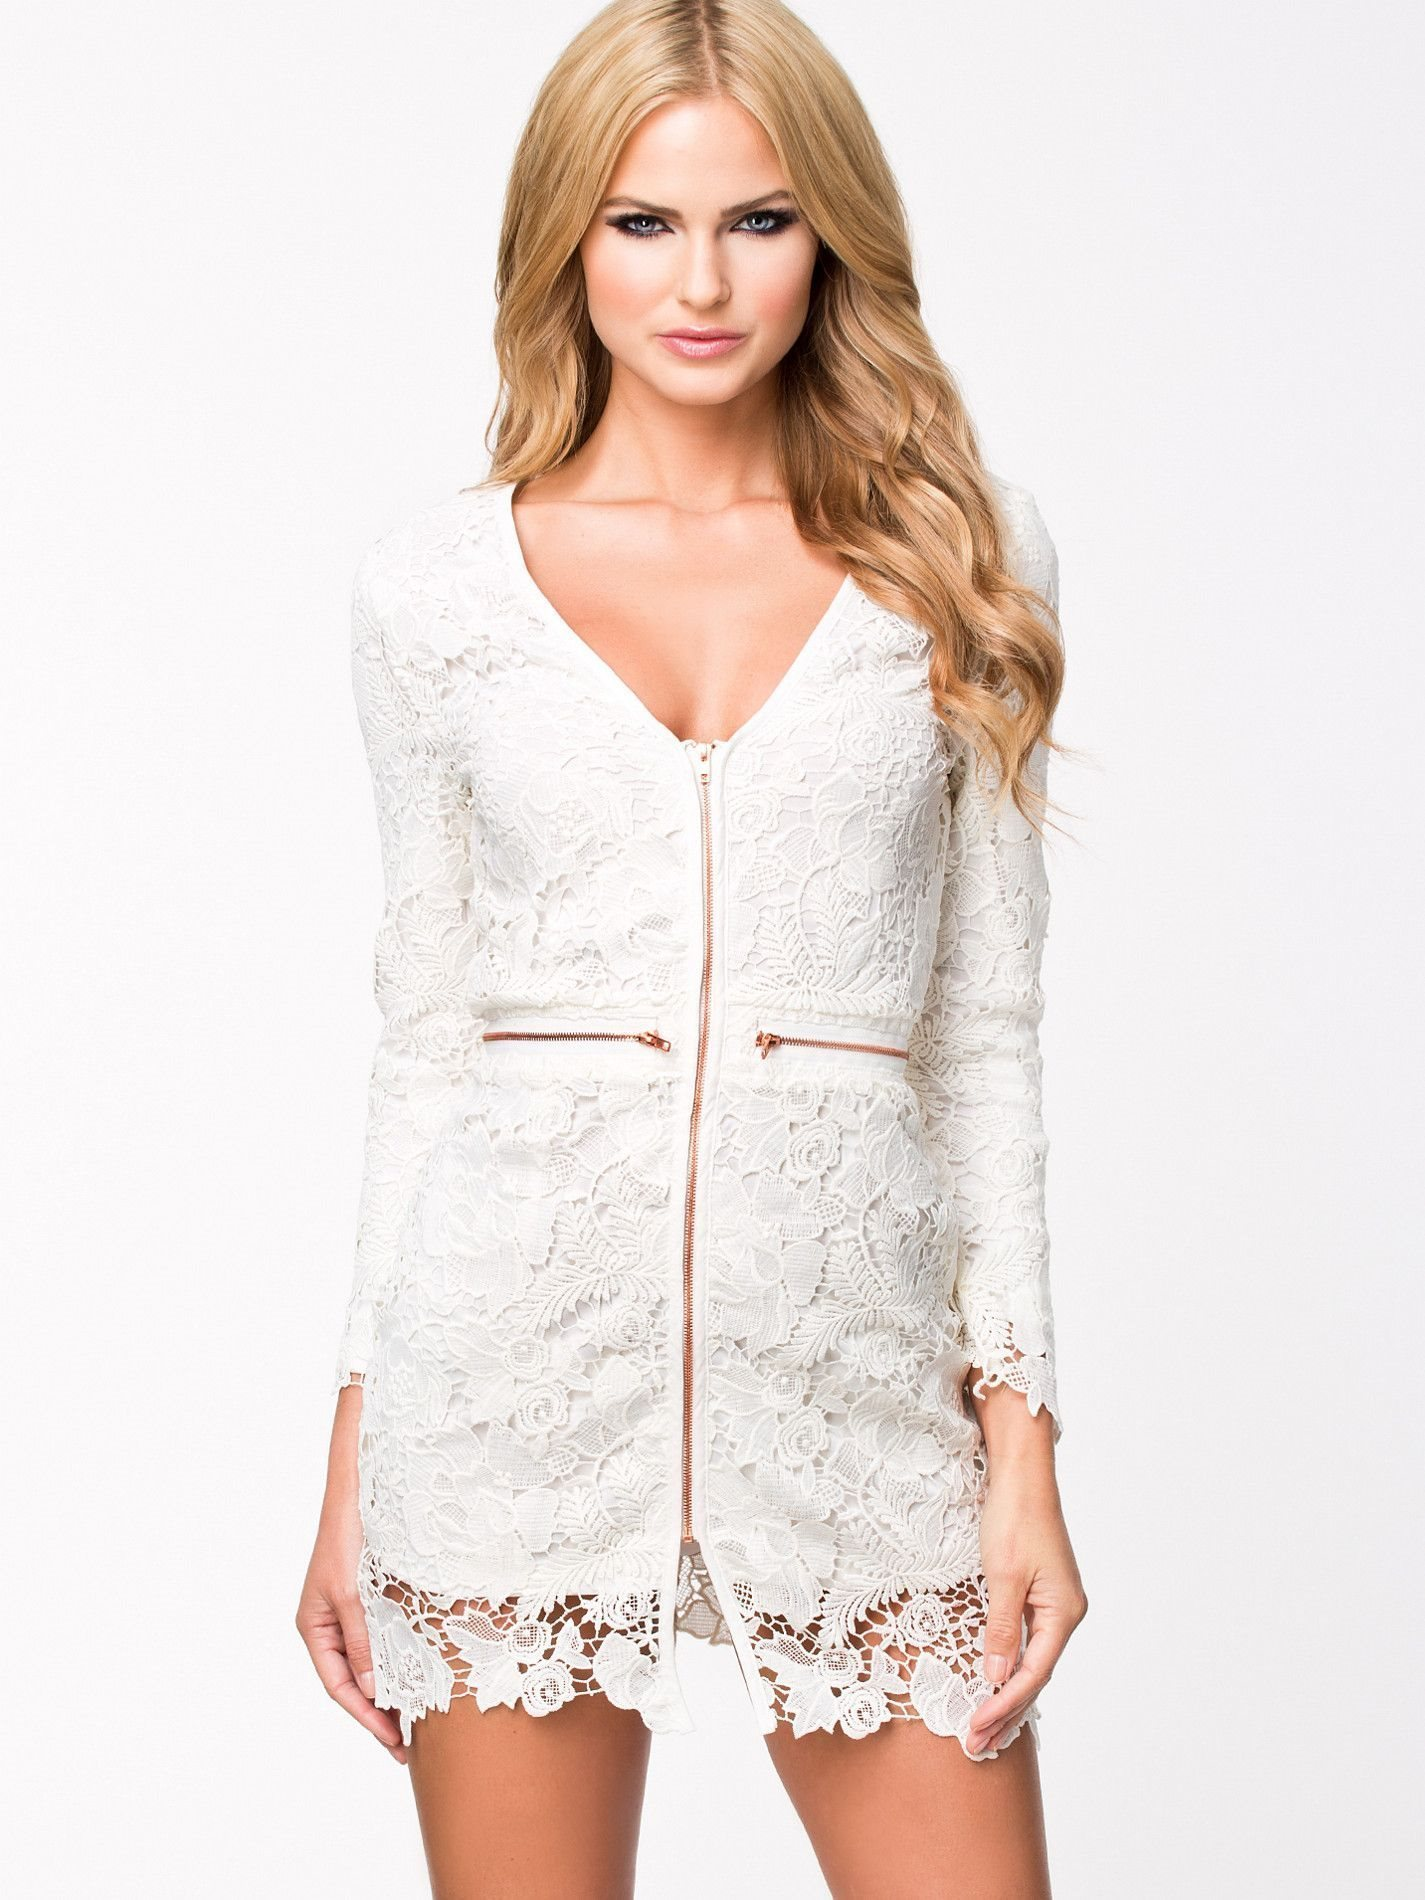 rebecca stella vit klänning